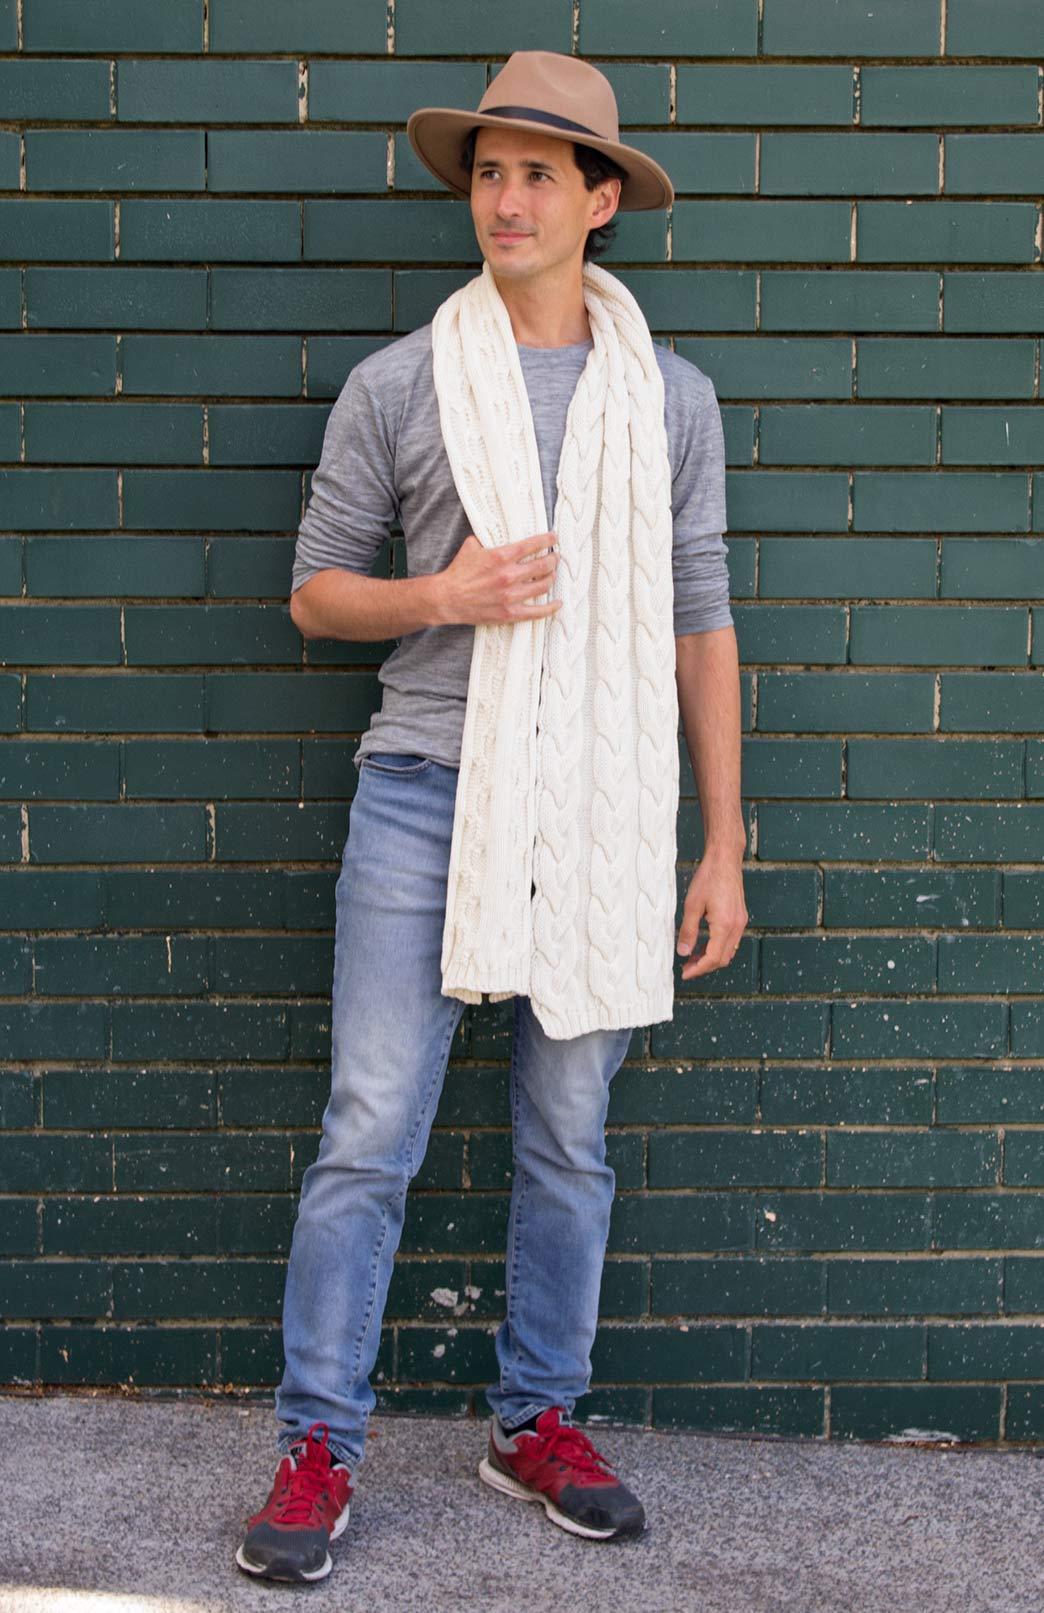 Men's Chunky Knit Cable Scarf - Men's Cream Chunky Merino Wool Knit Scarf with Cable Detailing - Smitten Merino Tasmania Australia